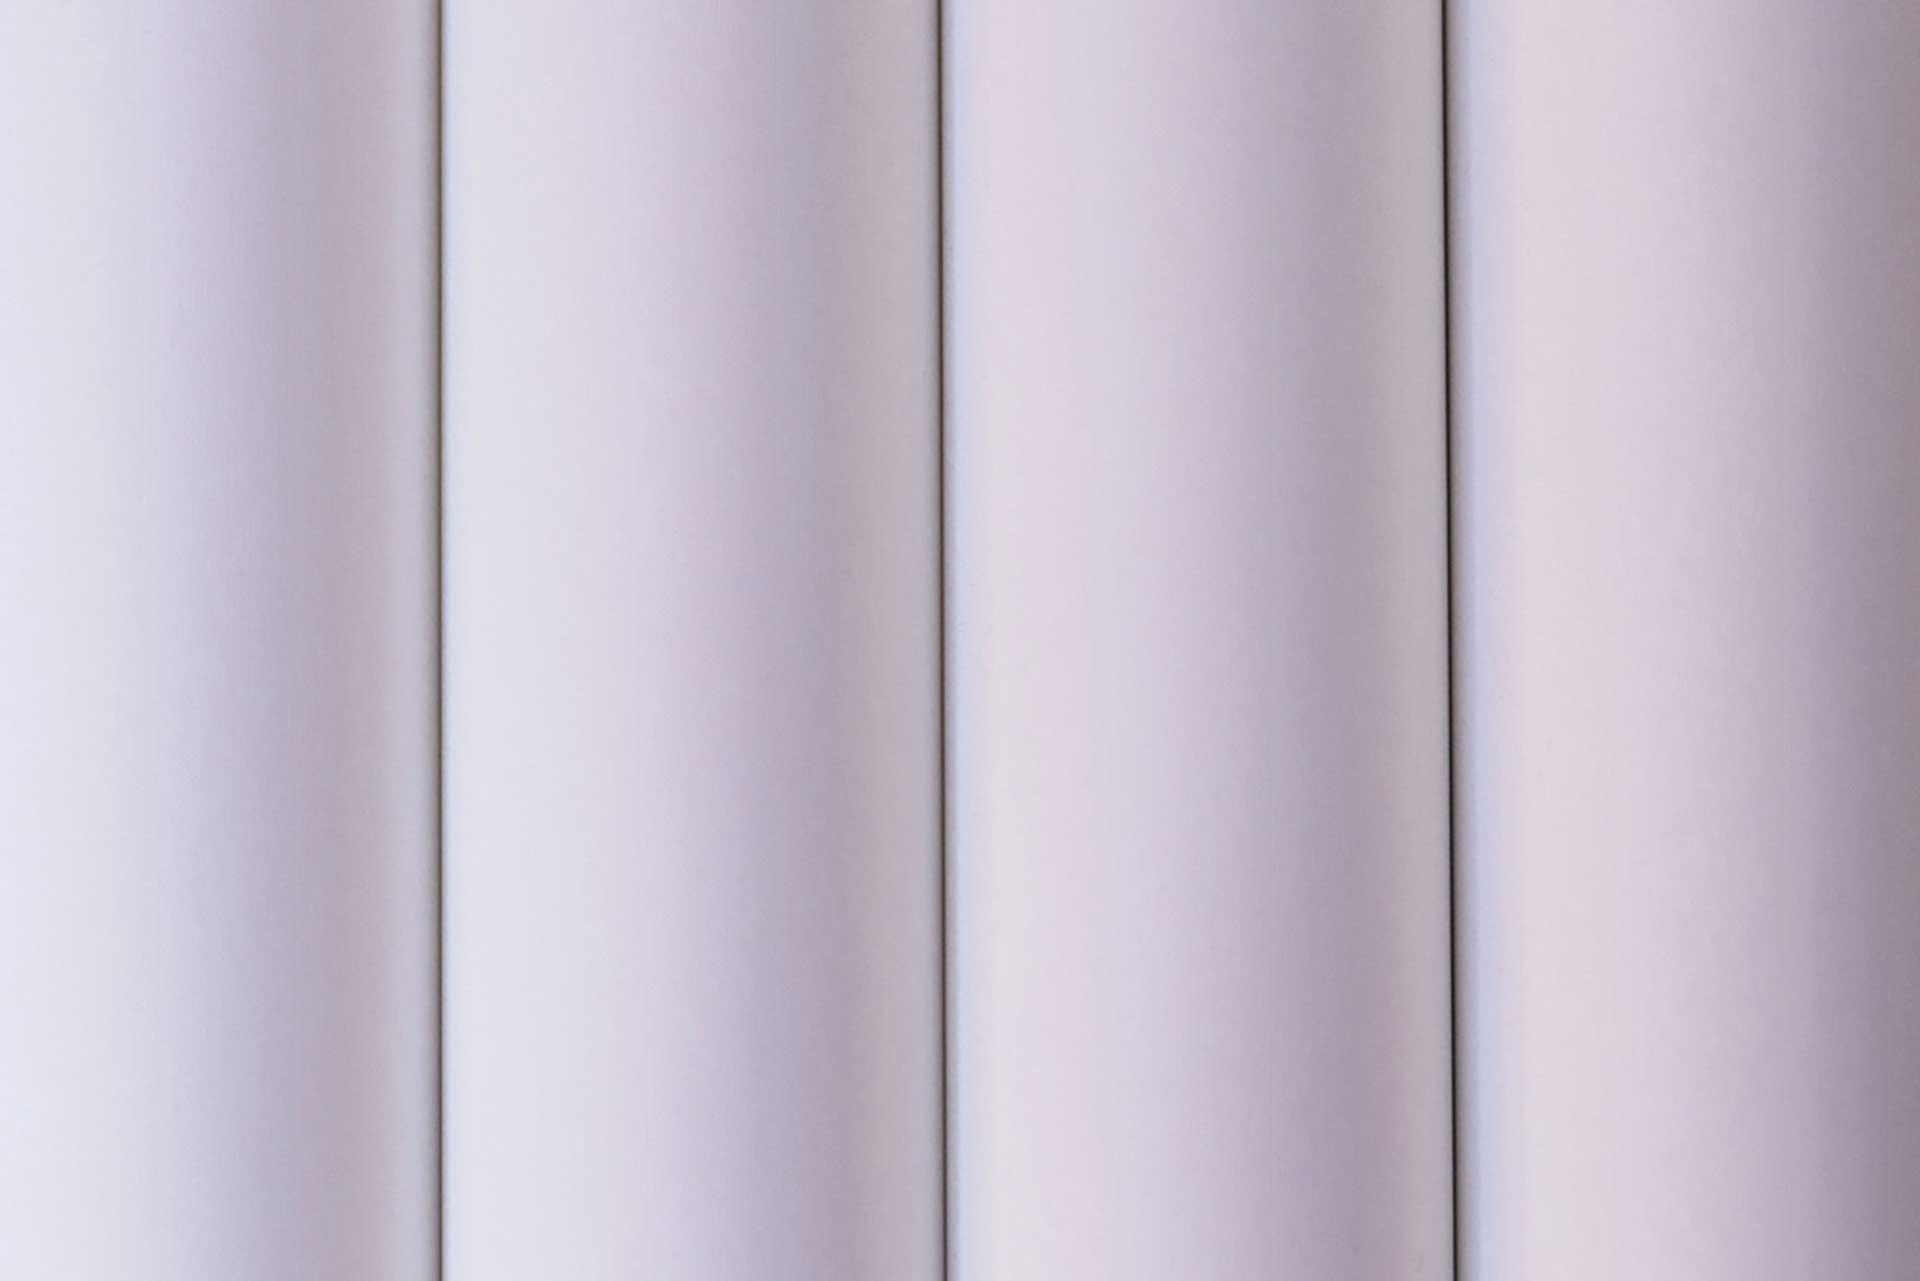 Oracover Paintingfabric 3 metre # 01